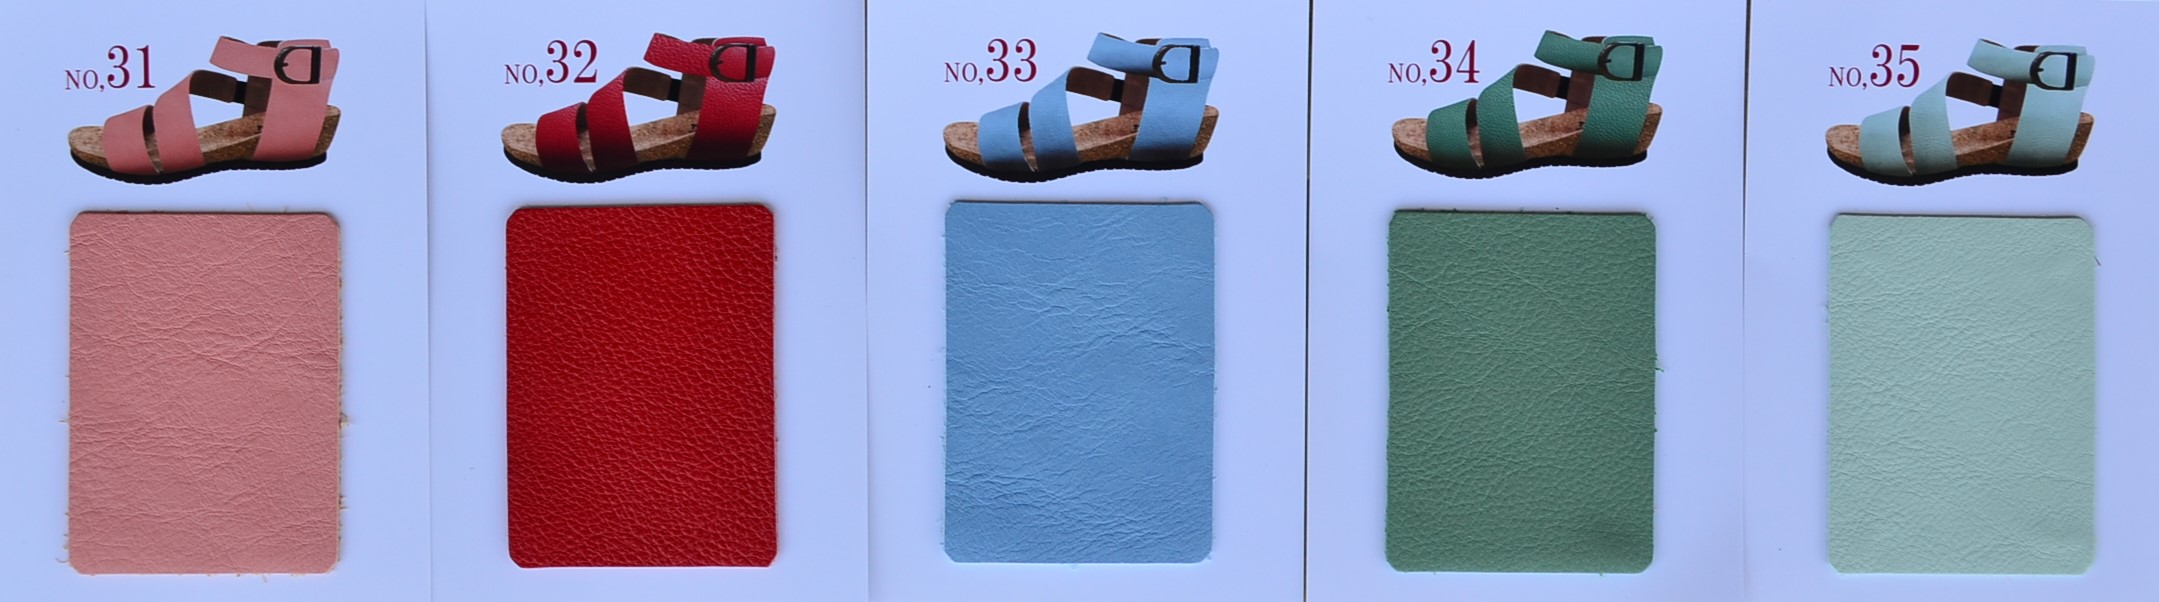 """BARCLAY~35色から選べるサンダル~Color Sample""_d0153941_15265041.jpg"